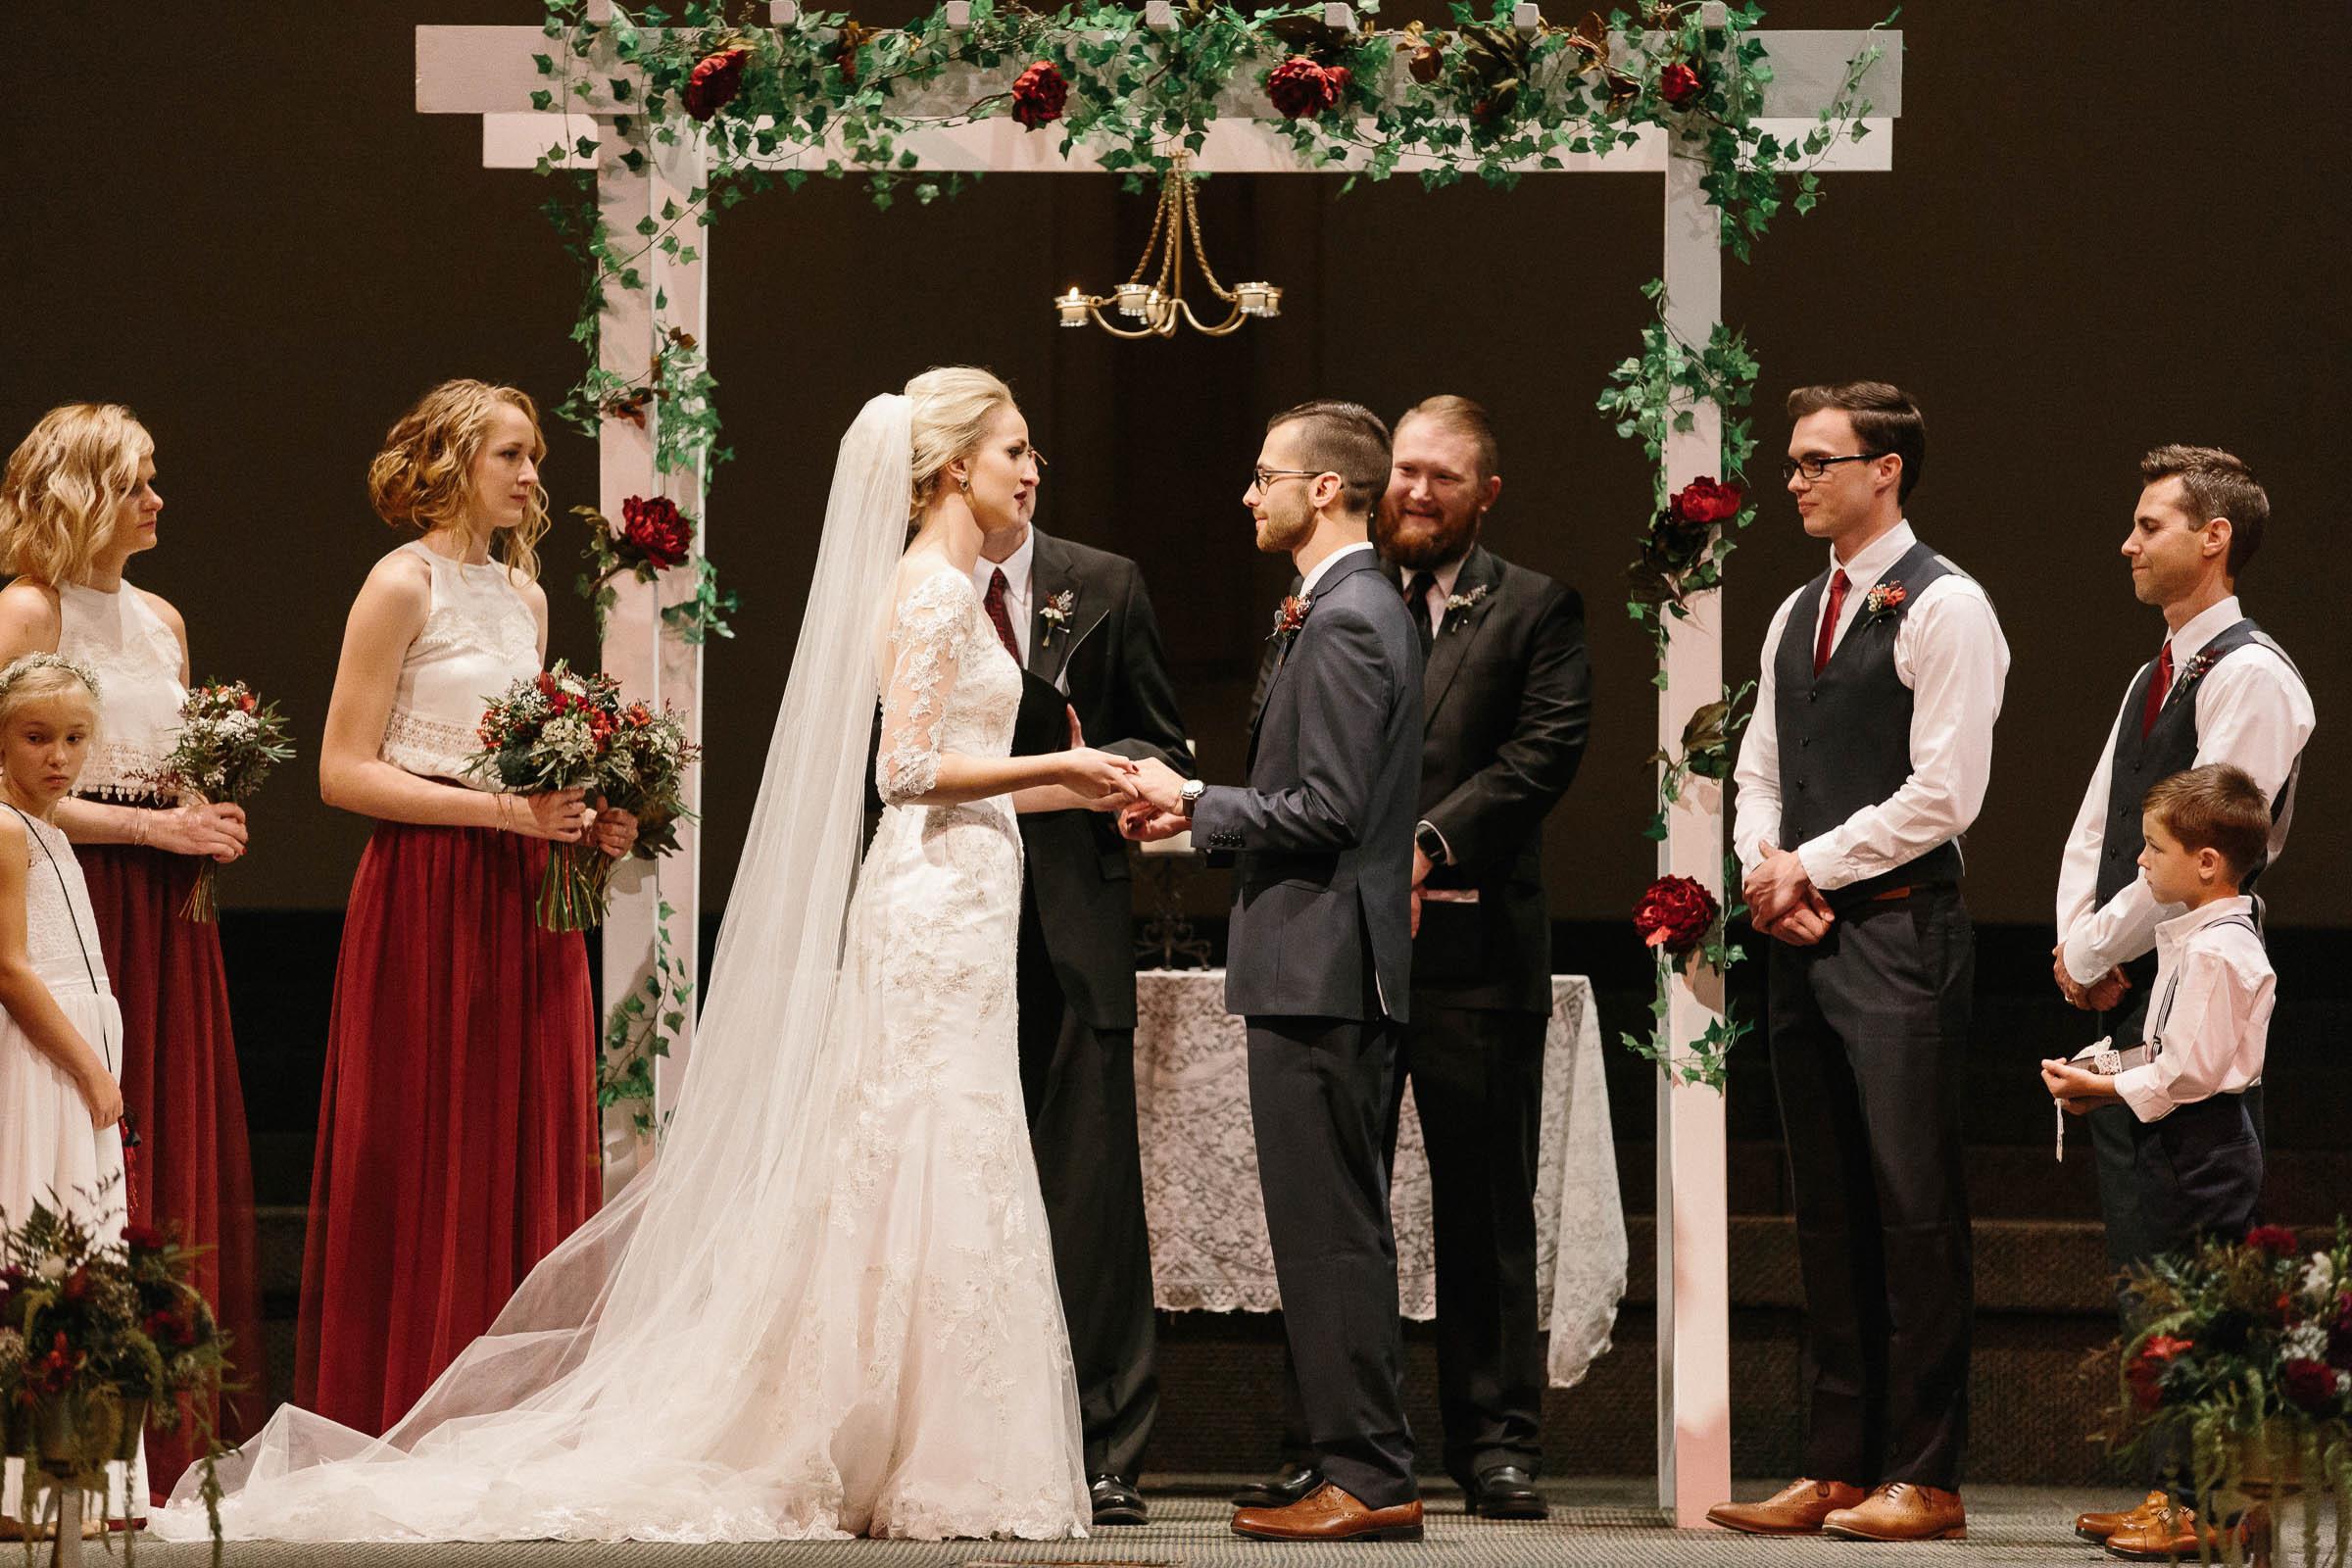 Jenna&Austin_SiouxFalls_Wedding_Photographer_076.jpg